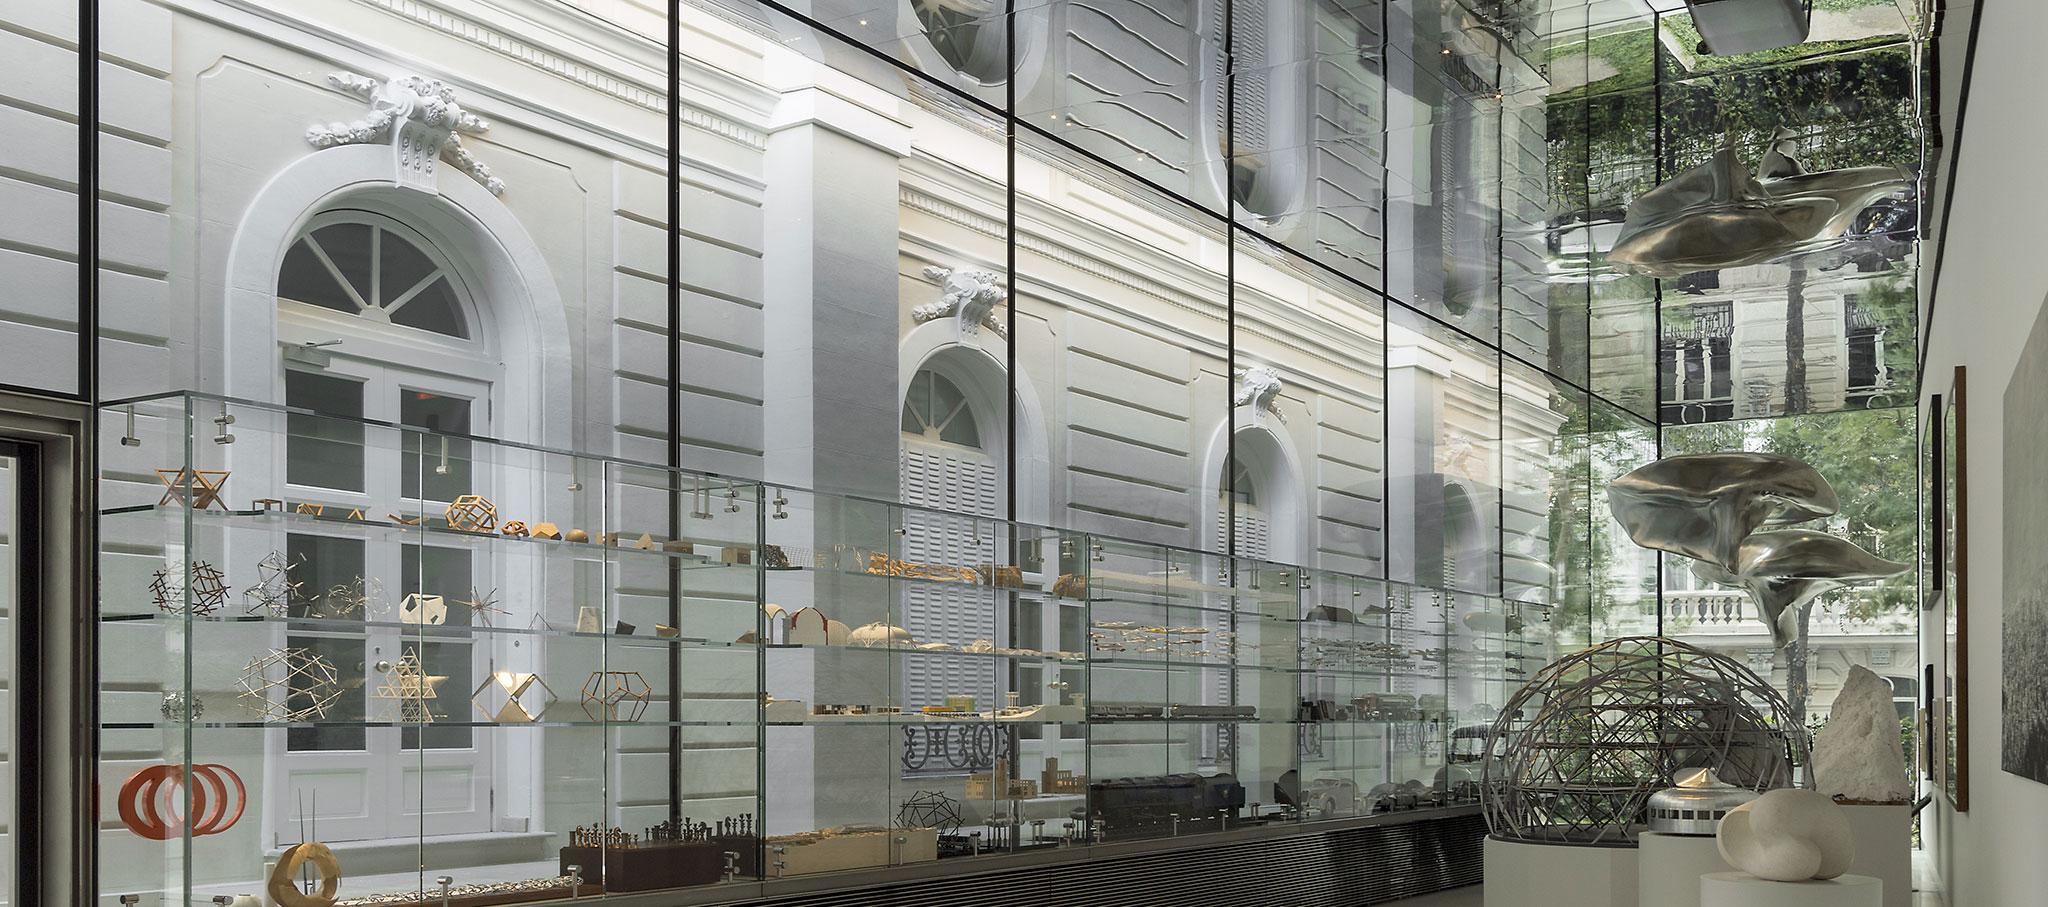 The Pavillion. Norman Foster Foundation. Photograph © Luis Asín